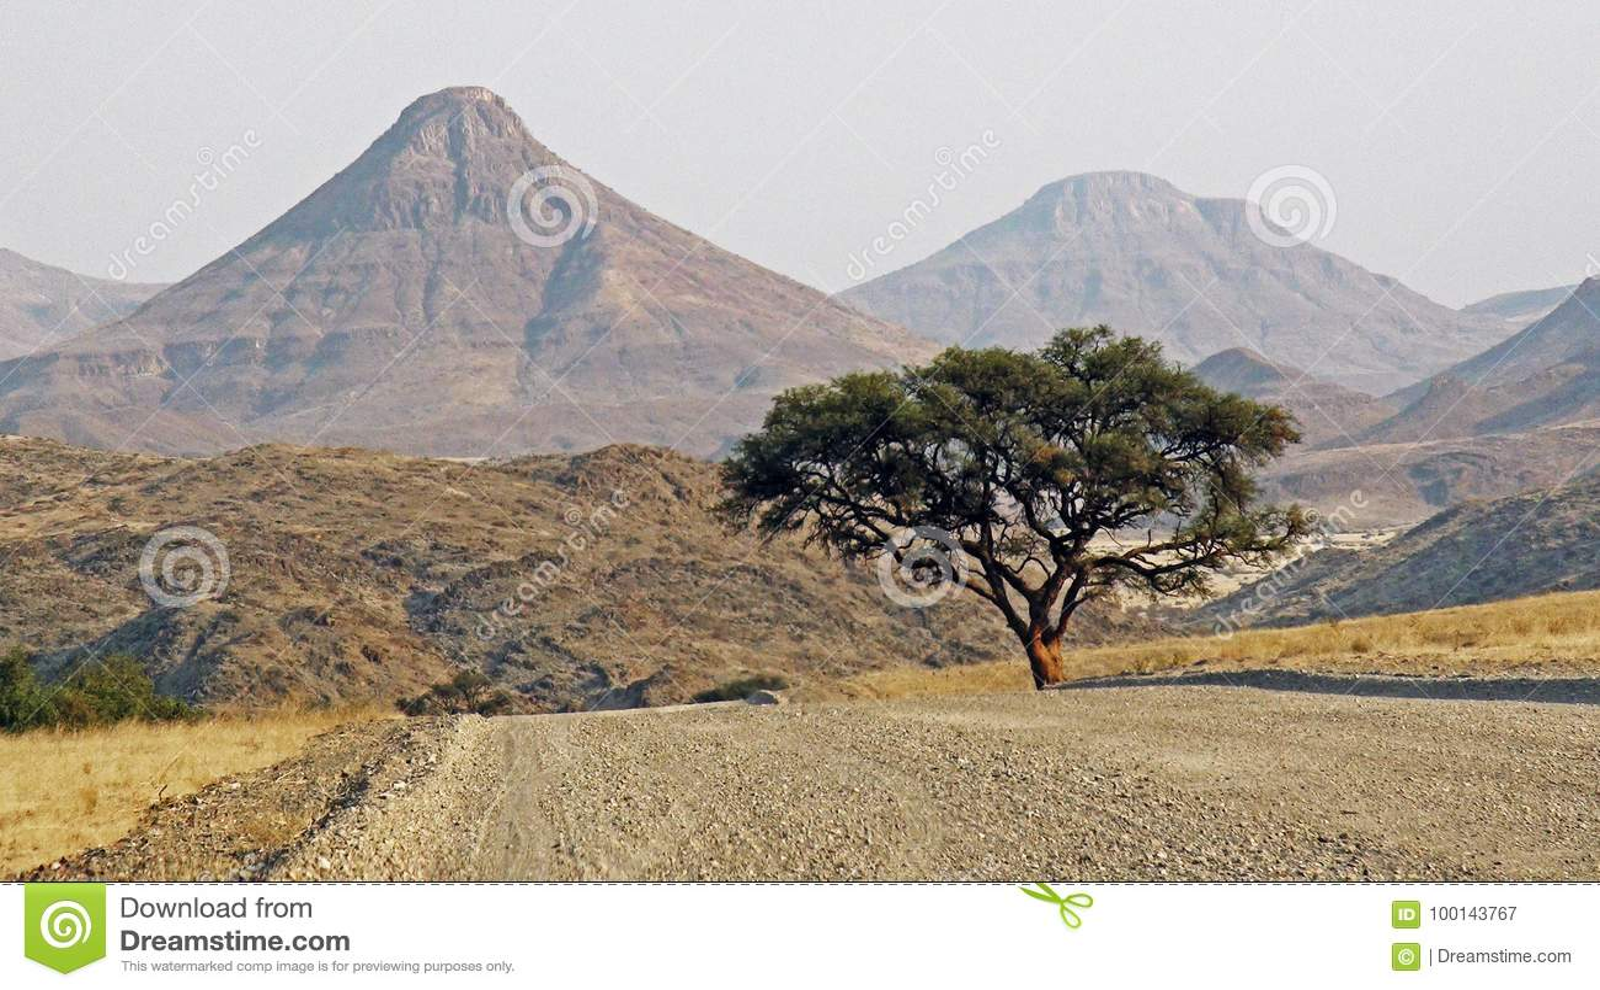 Namibia, Damaraland,